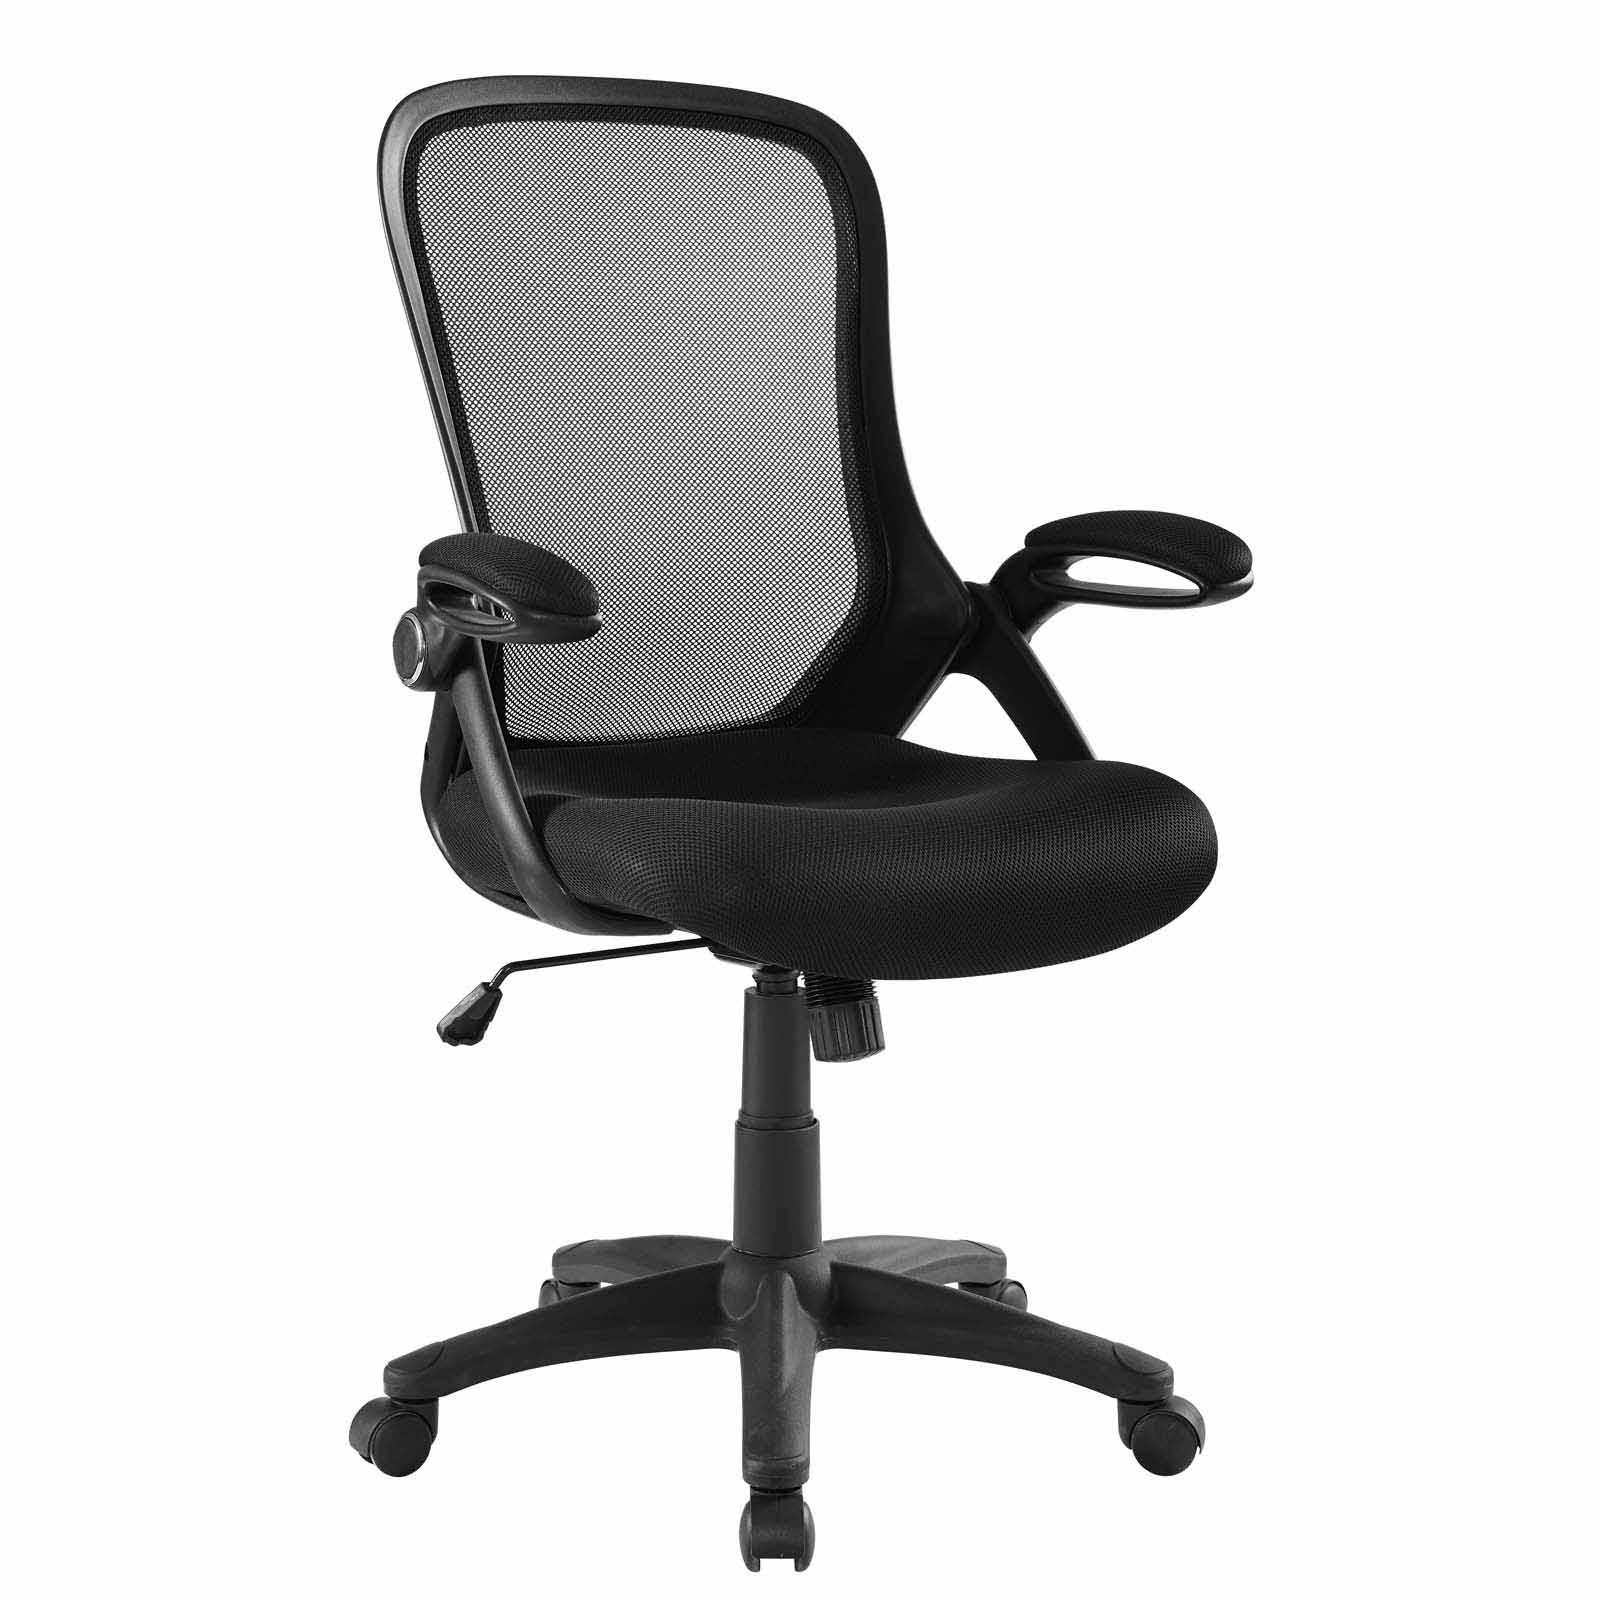 Assert Mesh Office Chair in Black